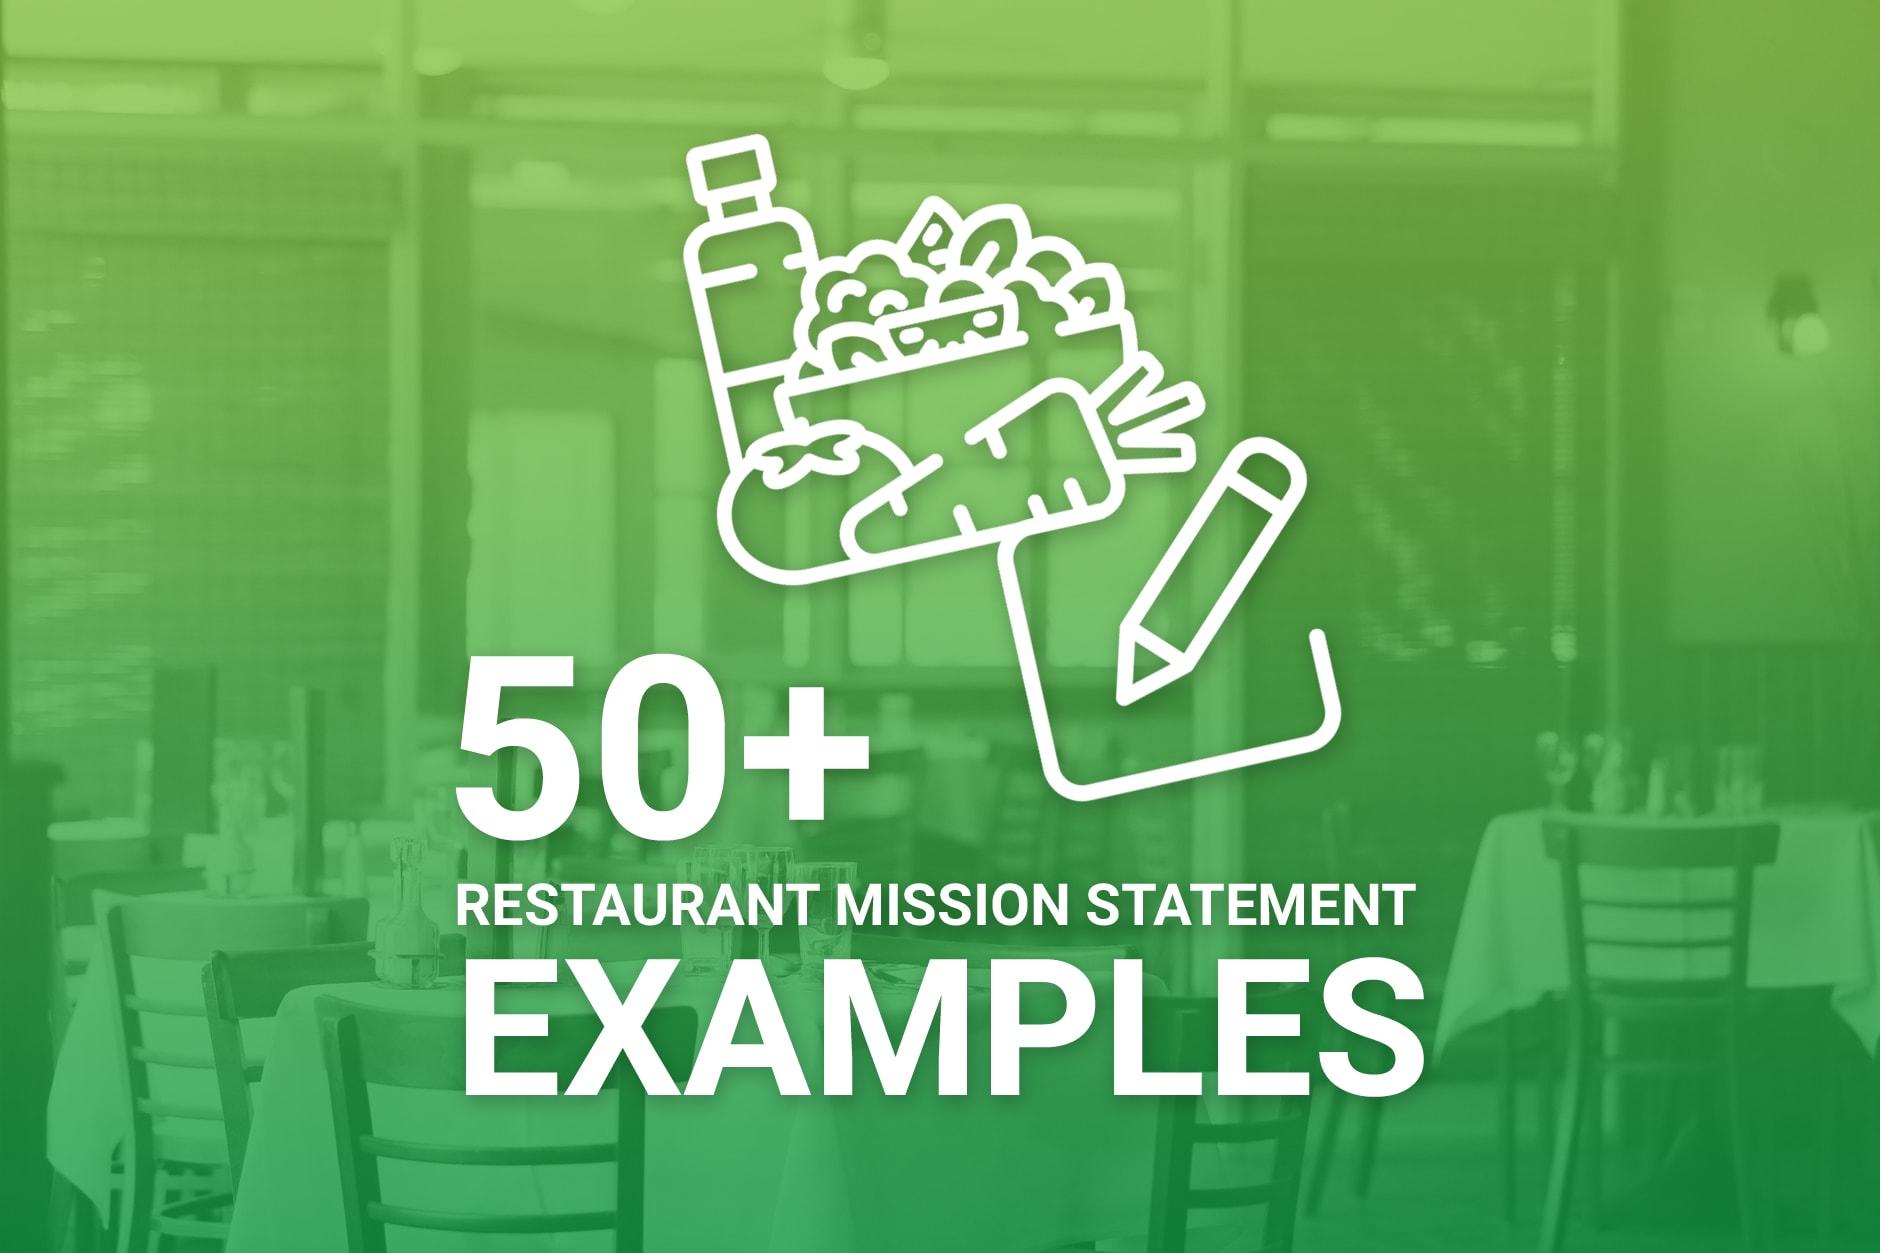 Restaurant Mission Statement Examples